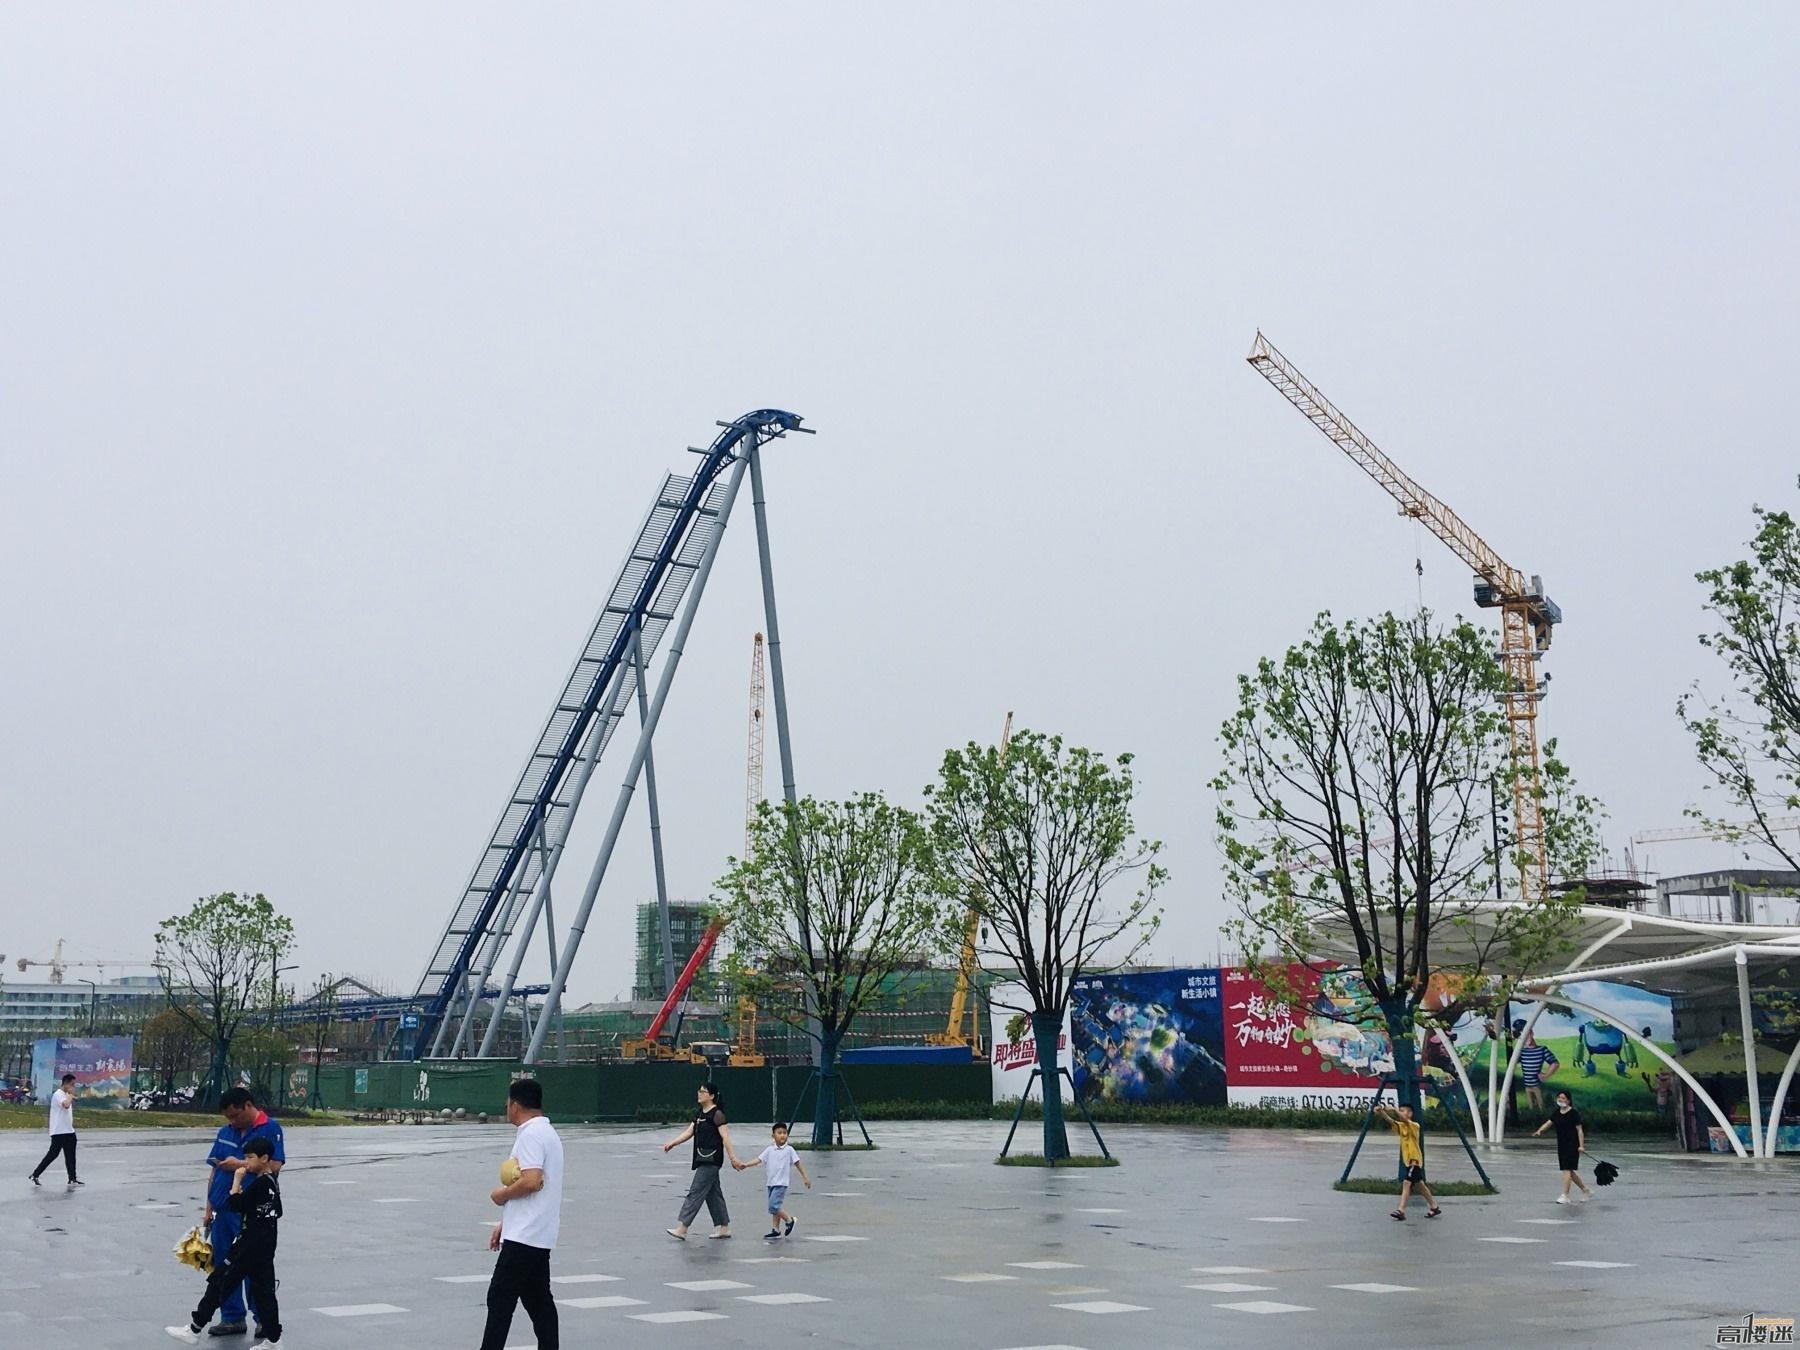 oct-theme-parks-happy-valley-49922500.jpg